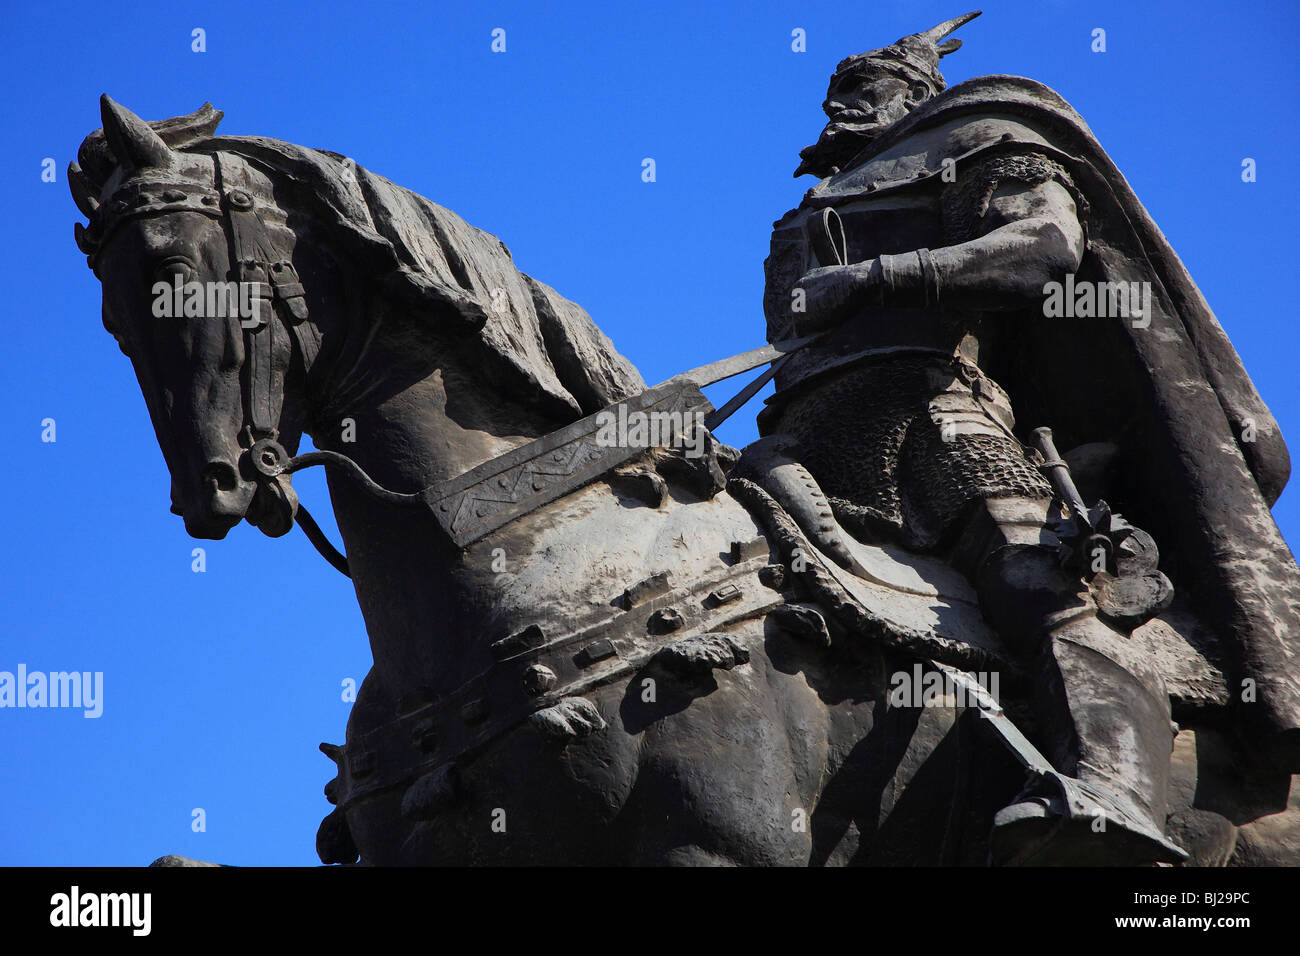 Statue of Skanderbeg, Tirana, Albania, Europe - Stock Image